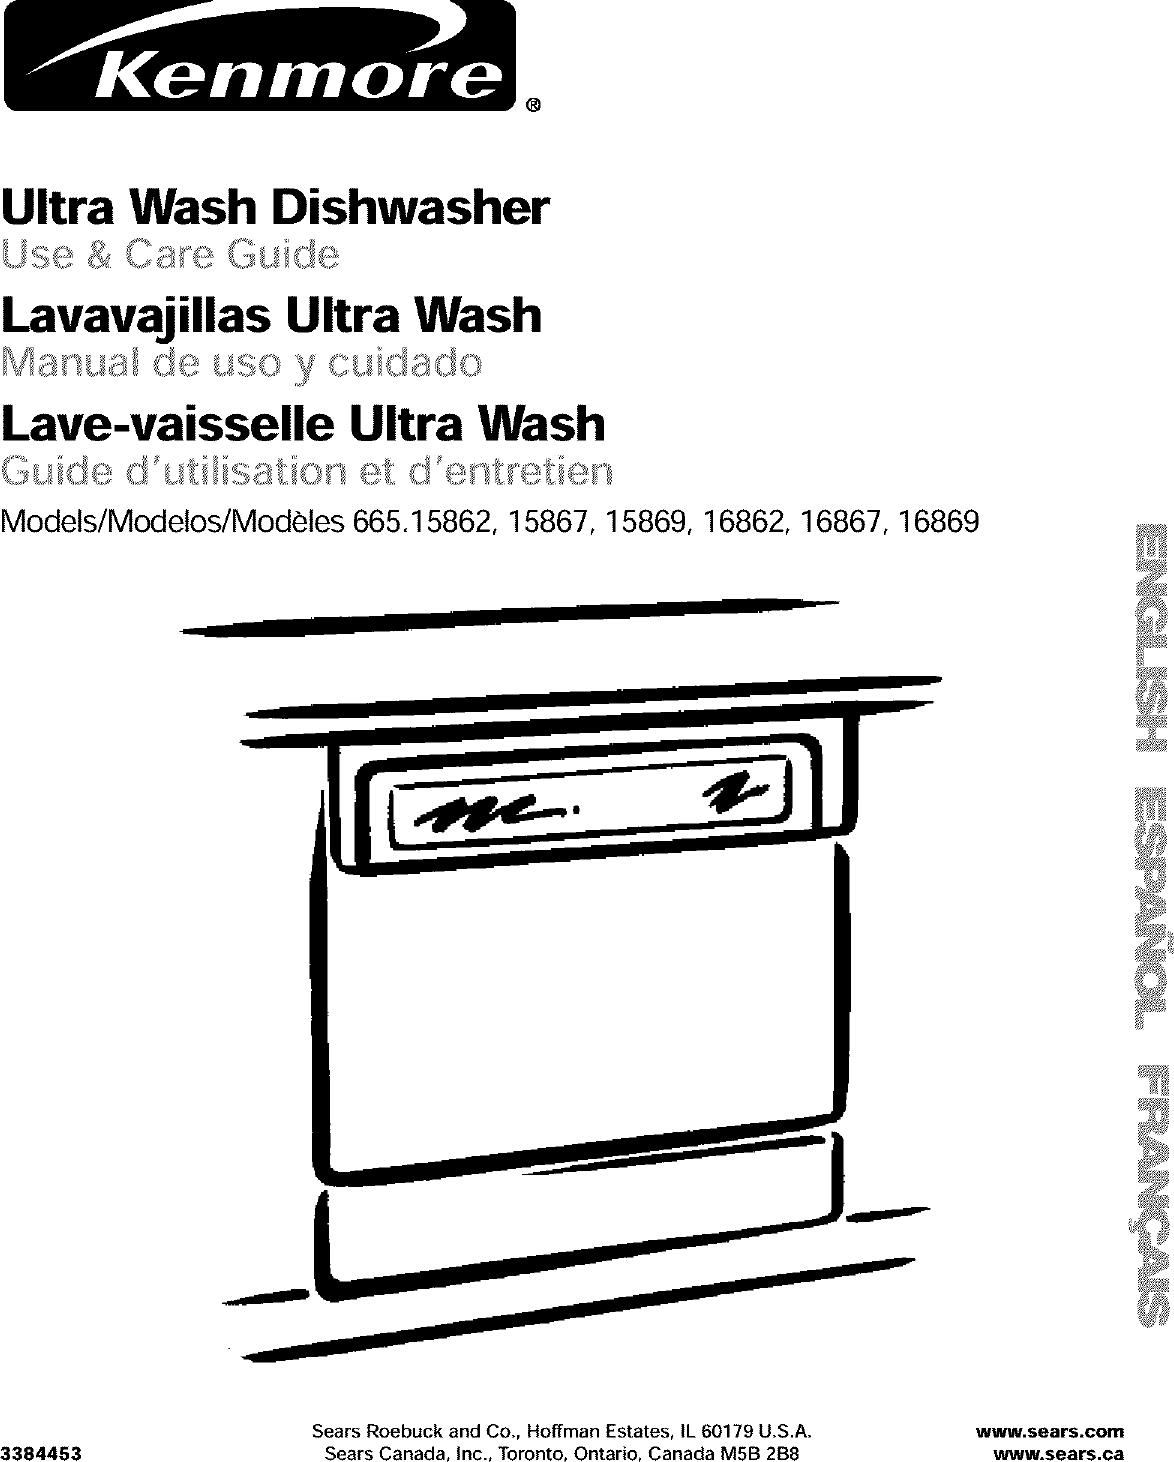 Kenmore 66515862990 User Manual DISHWASHER Manuals And